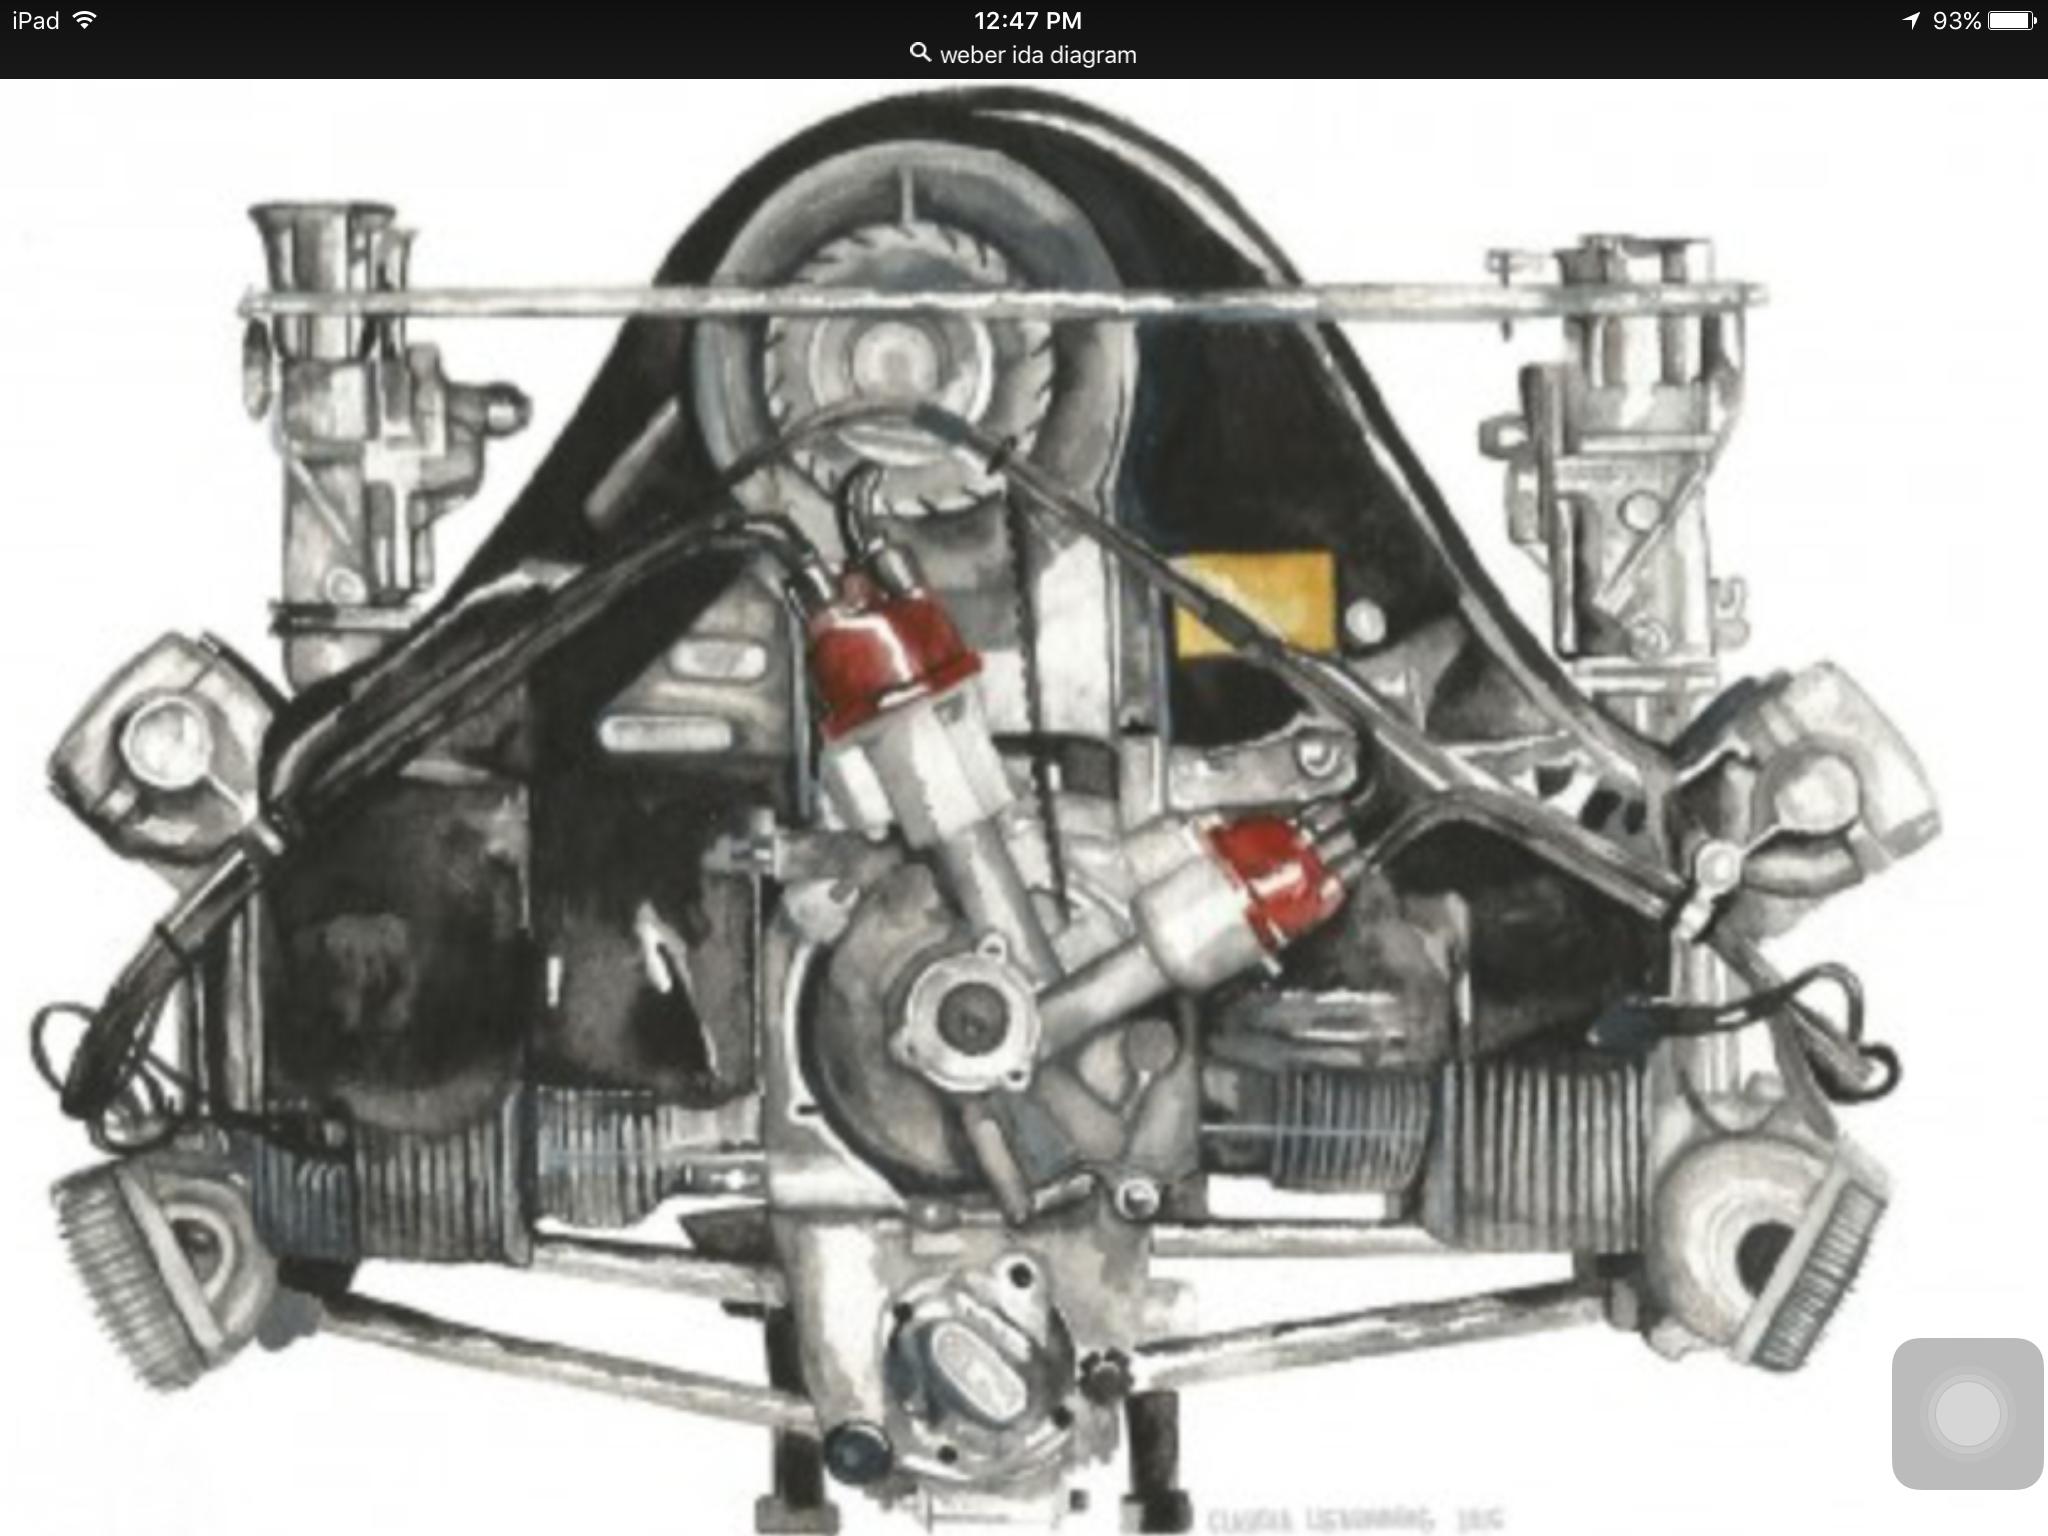 1960 4 cam porsche porsche pinterest engine, porsche 356 and engine diagram porsche 356 pre 1960 4 cam porsche porsche pinterest engine, porsche 356 and